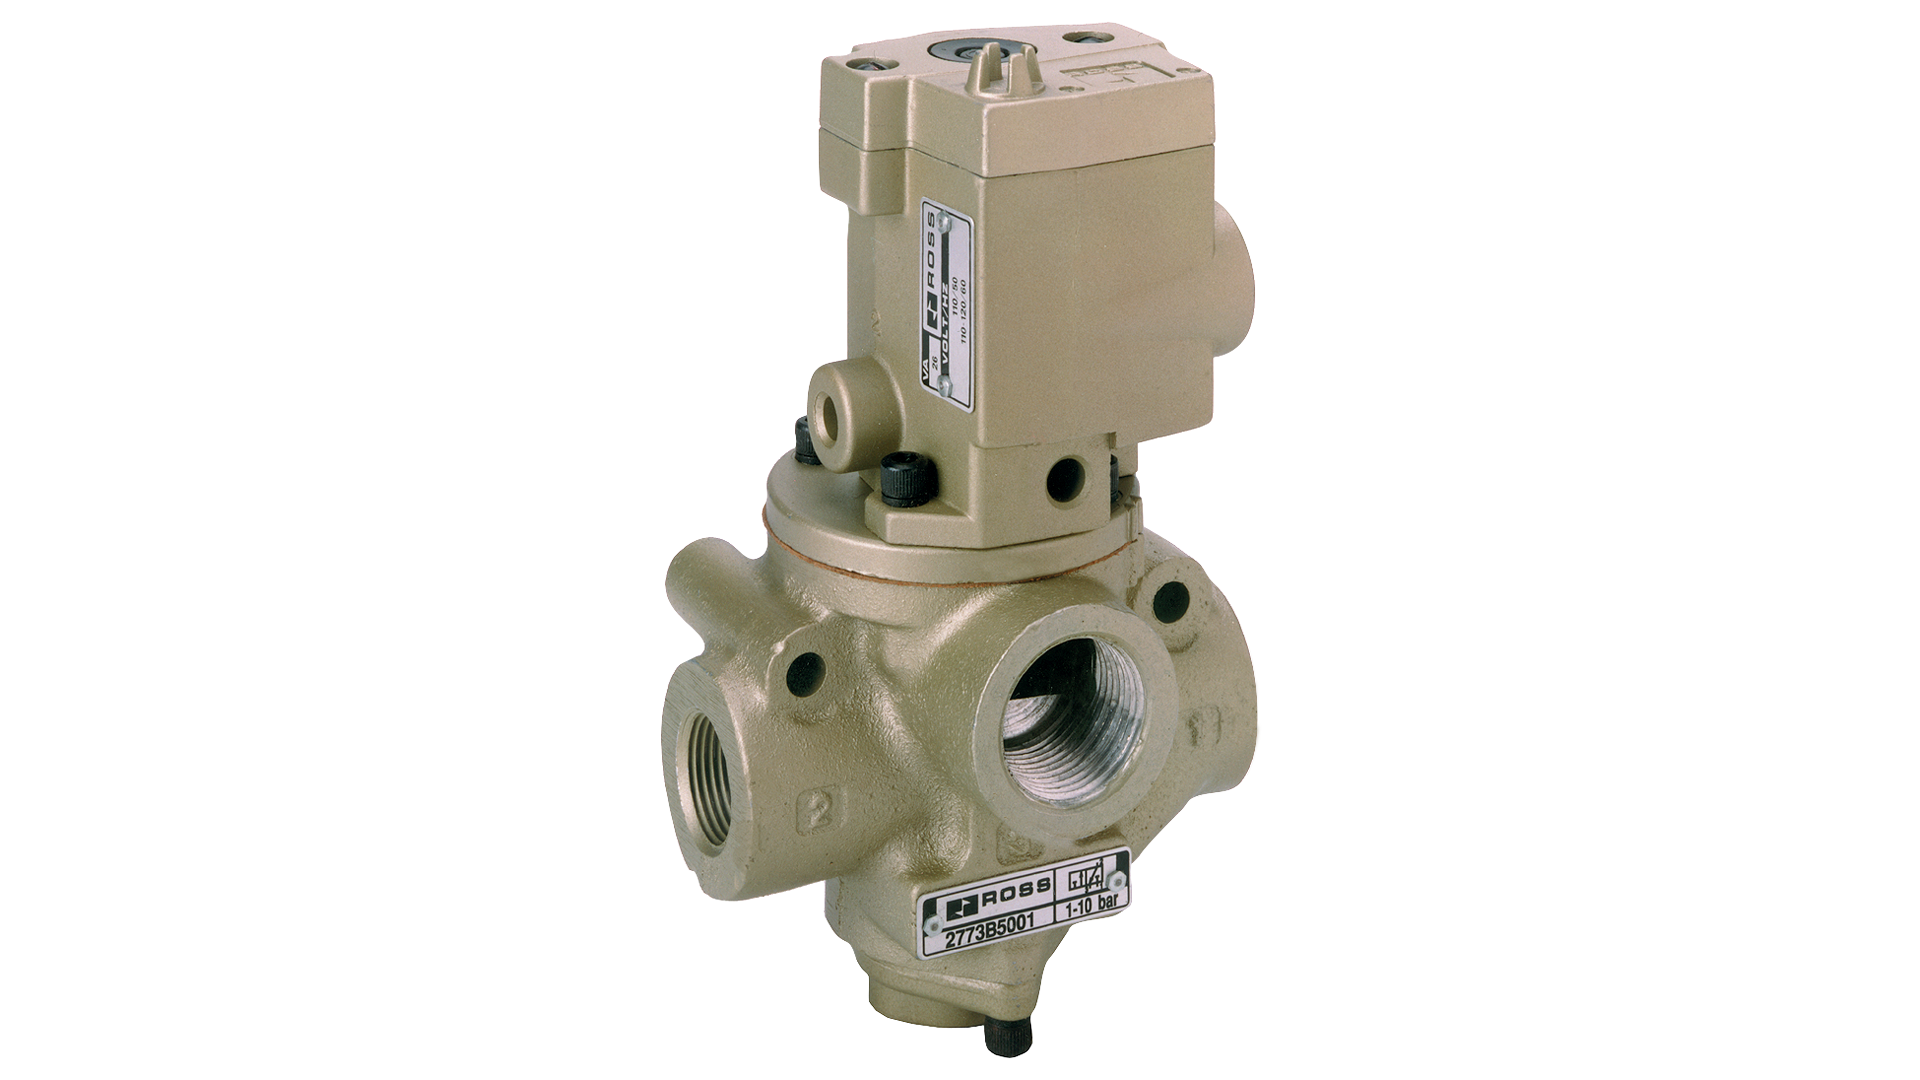 27 series 3w sc inline valves